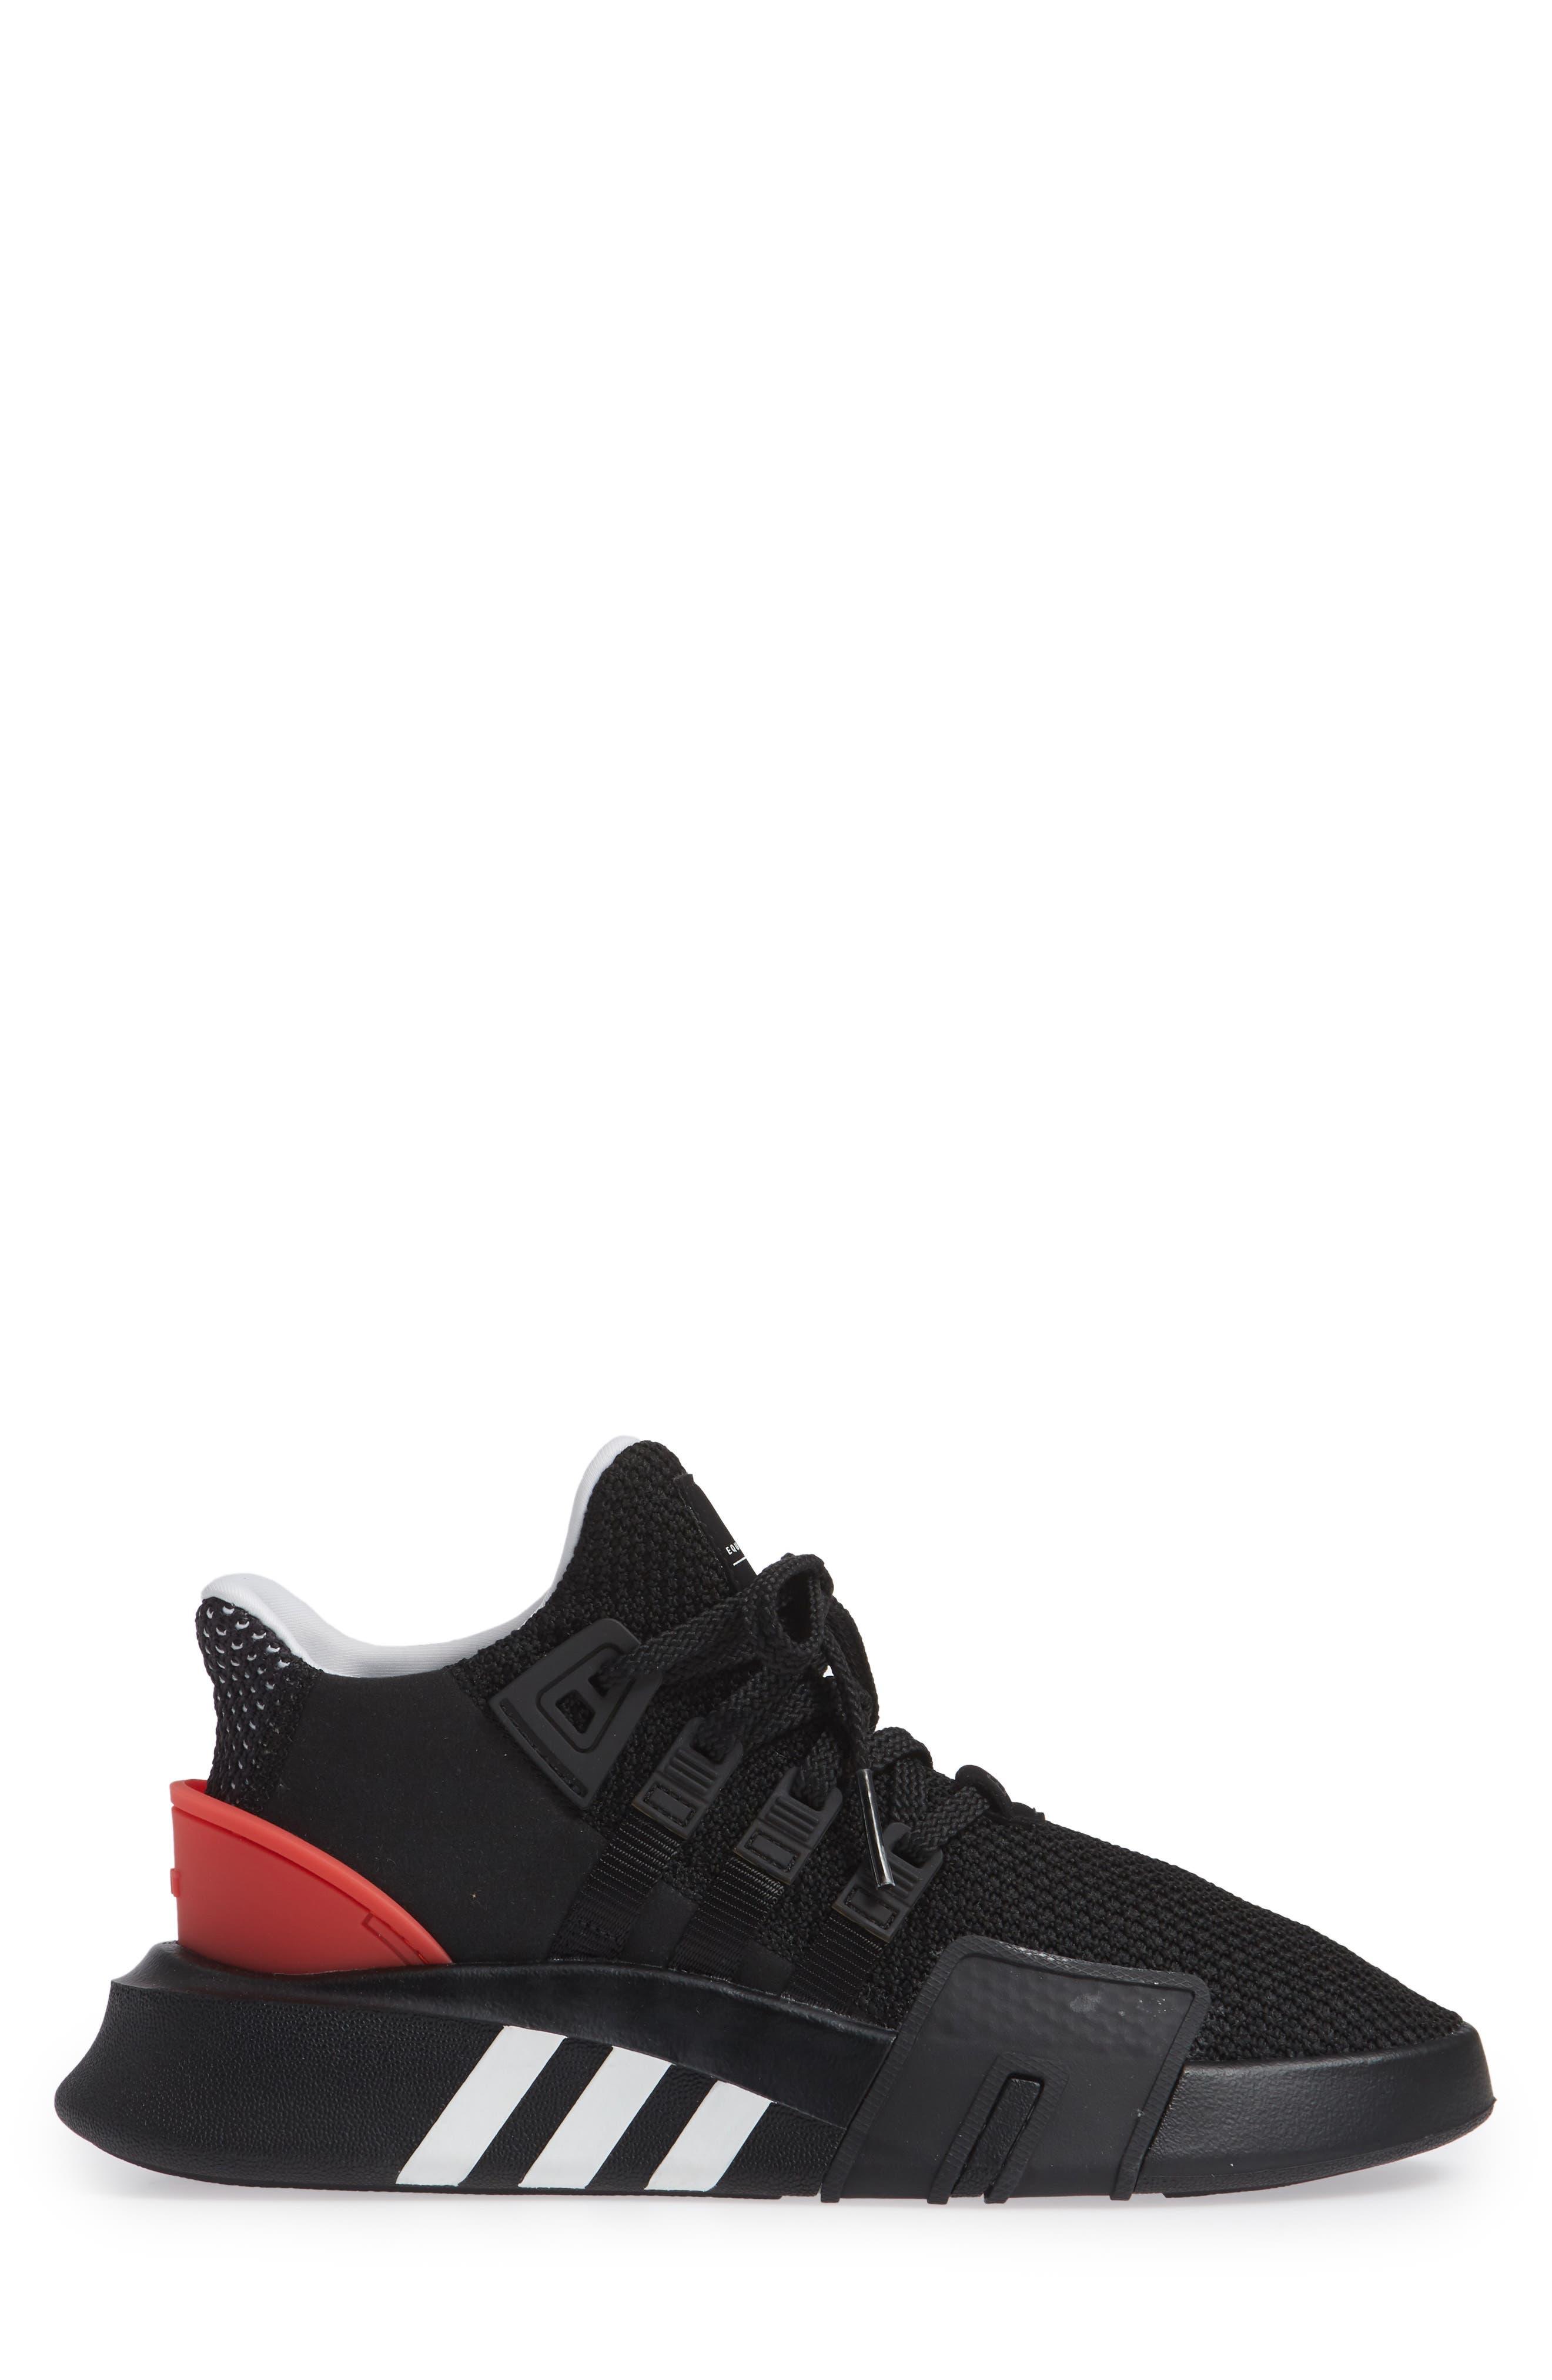 EQT Basketball ADV Sneaker,                             Alternate thumbnail 3, color,                             Black/ White/ Hi-Res Red